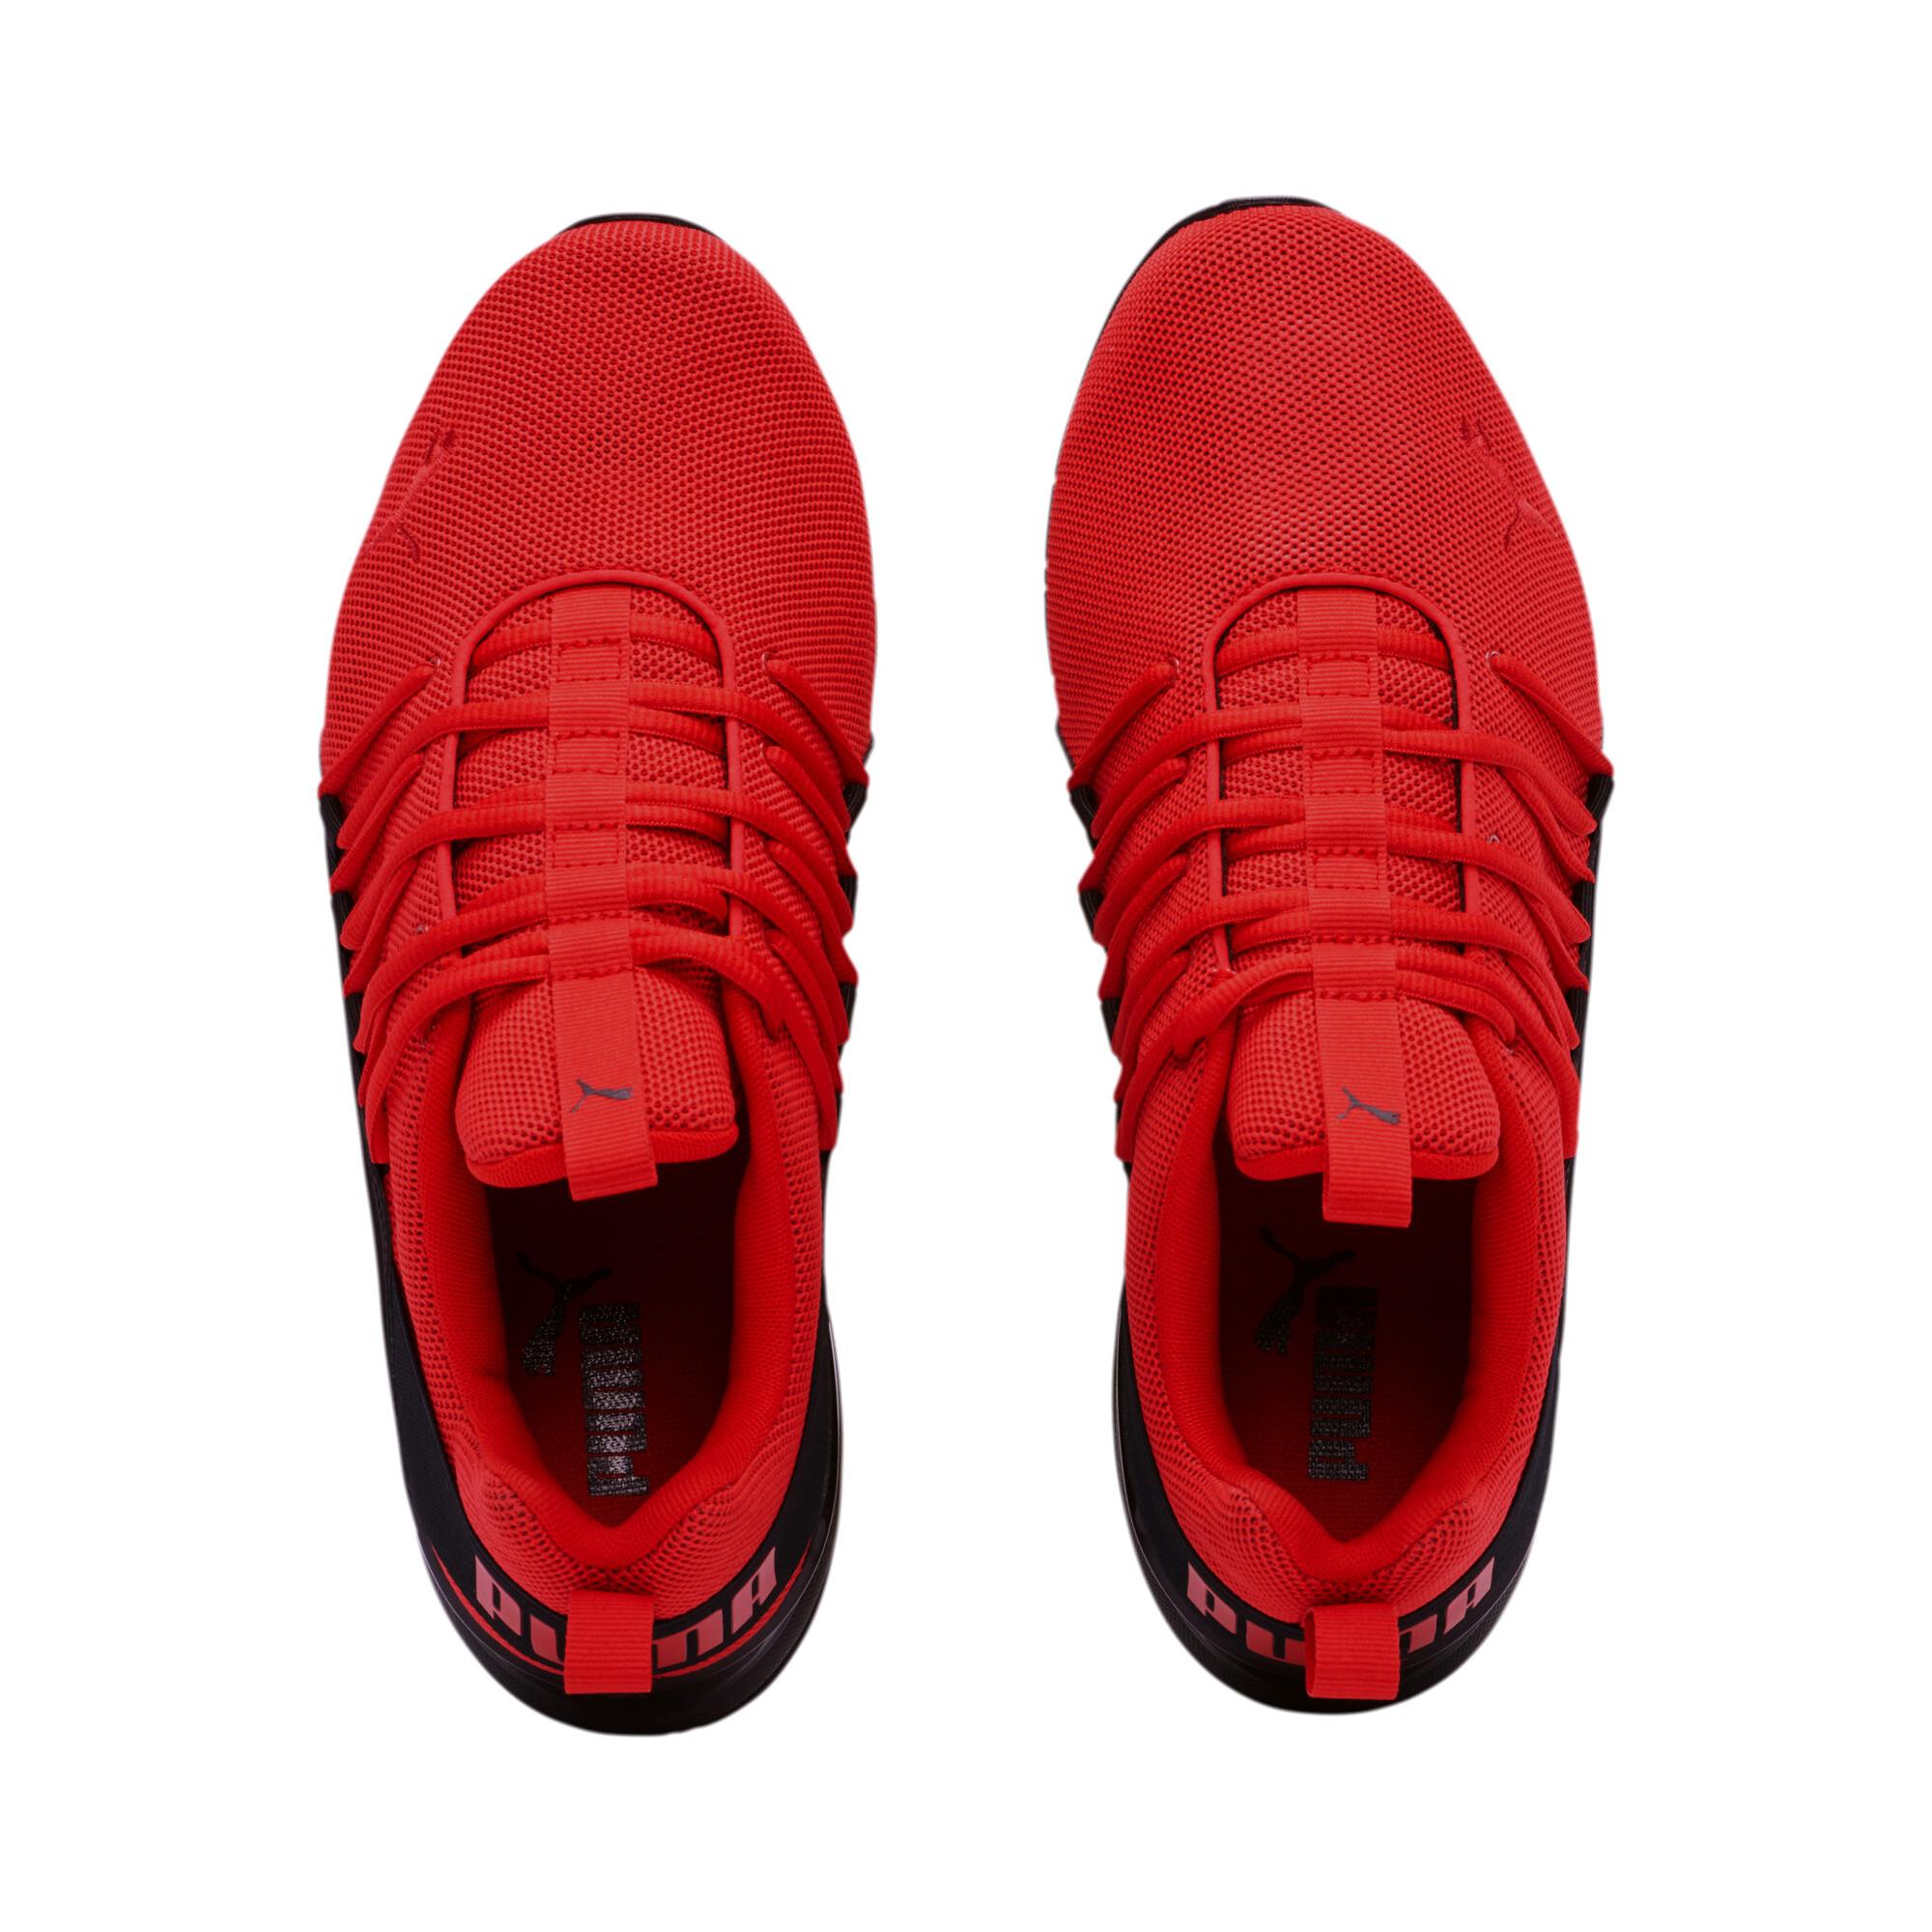 PUMA-Momenta-Men-039-s-Training-Shoes-Men-Shoe-Running thumbnail 19